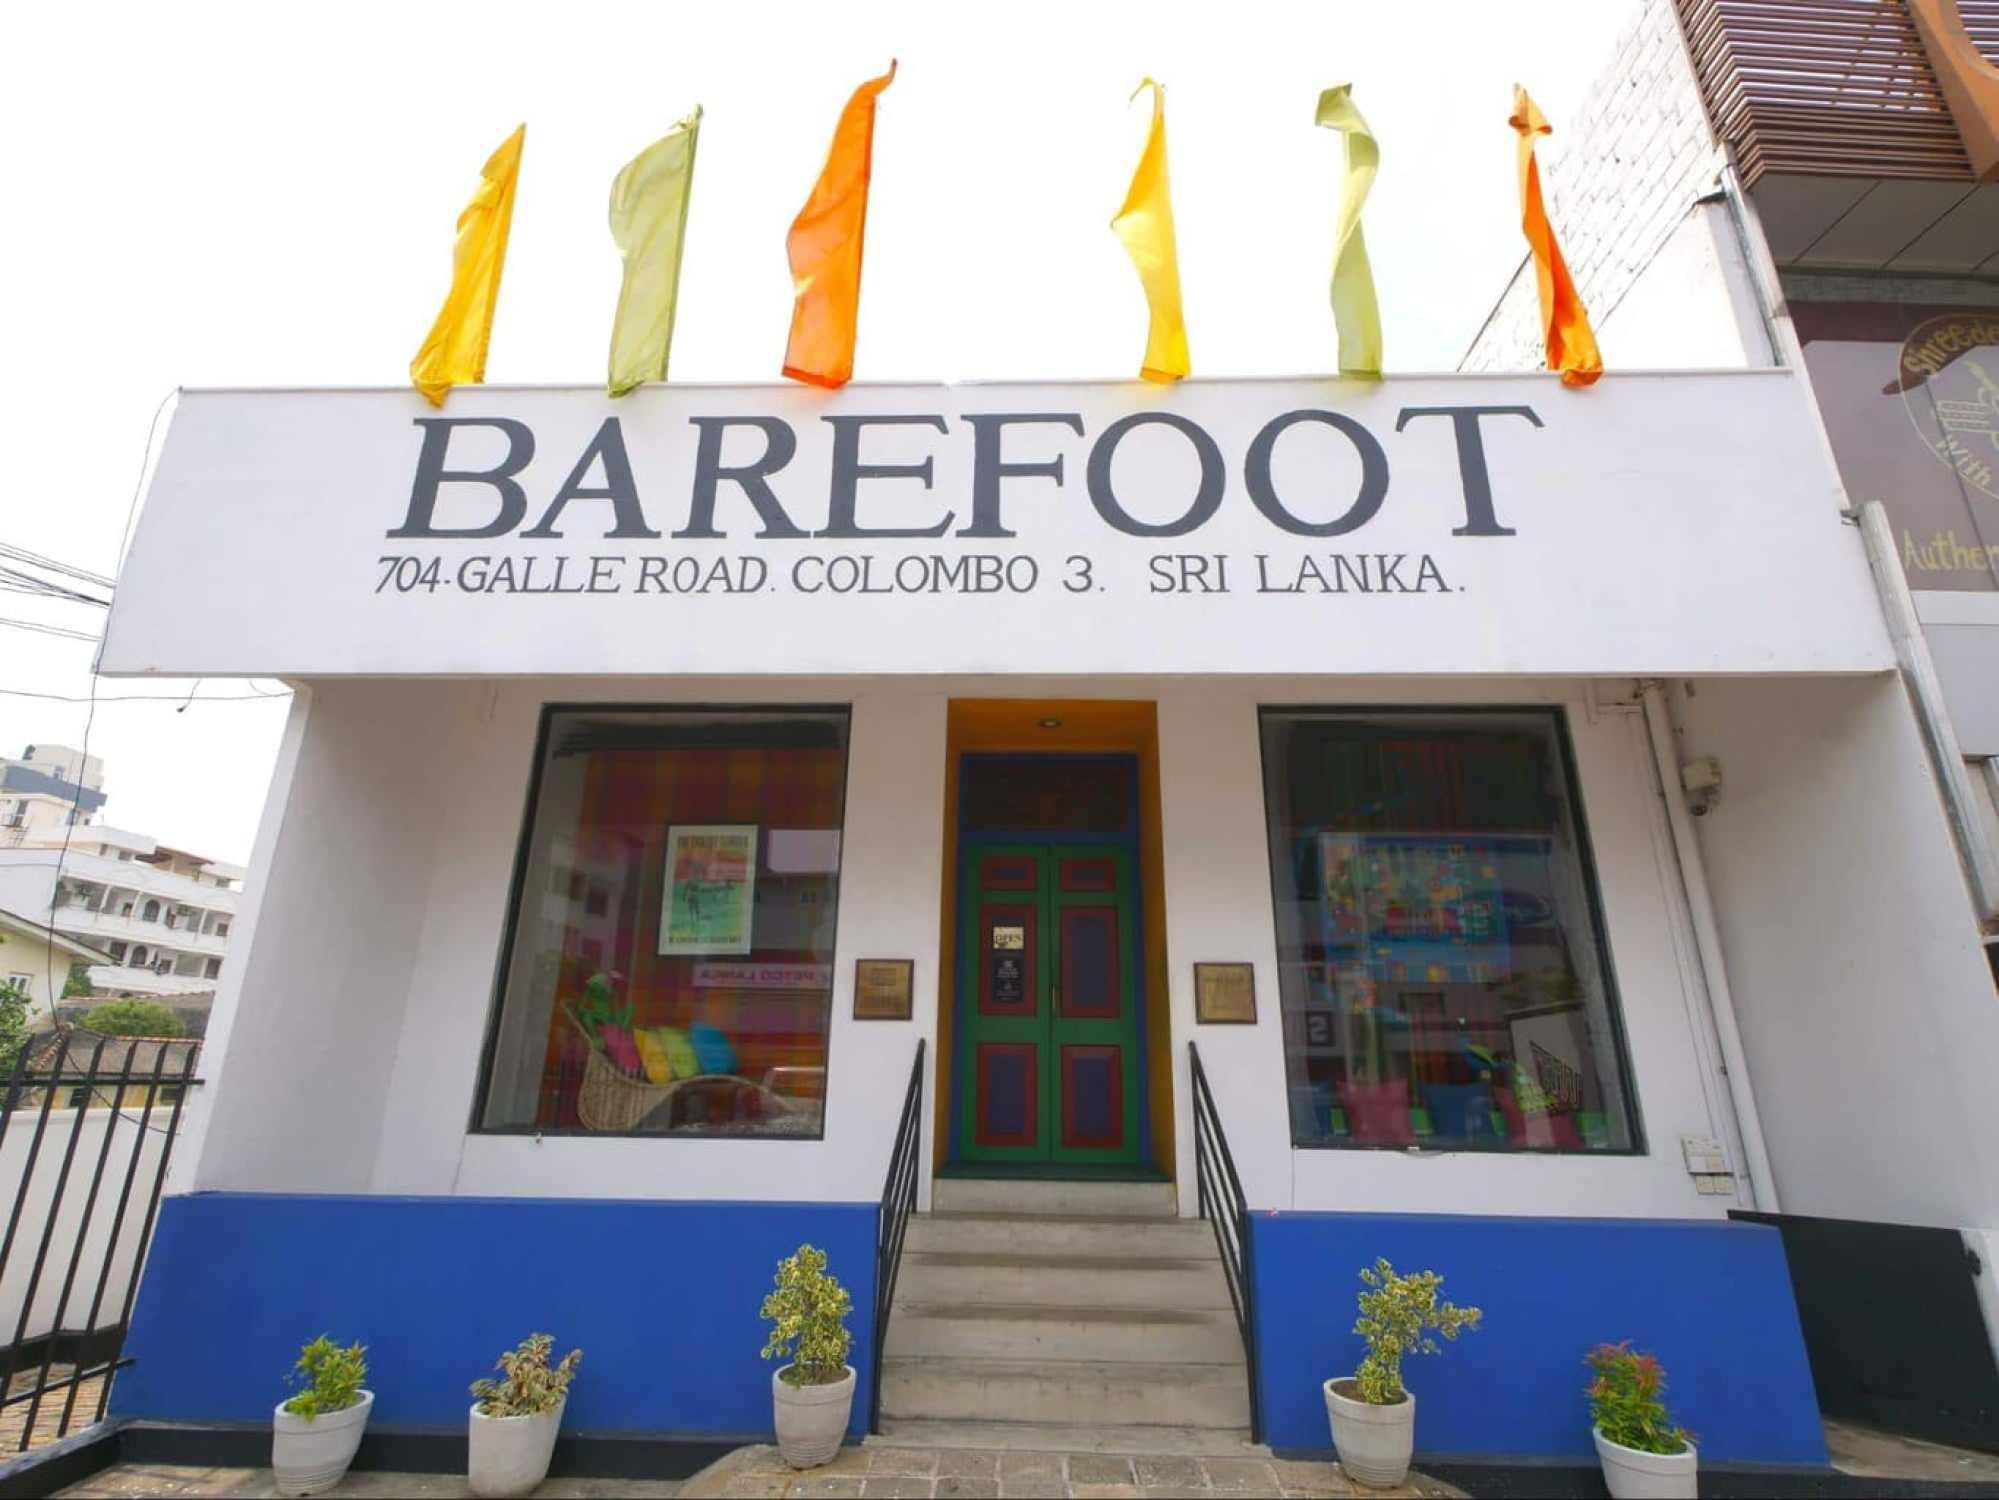 Barefoot Colombo